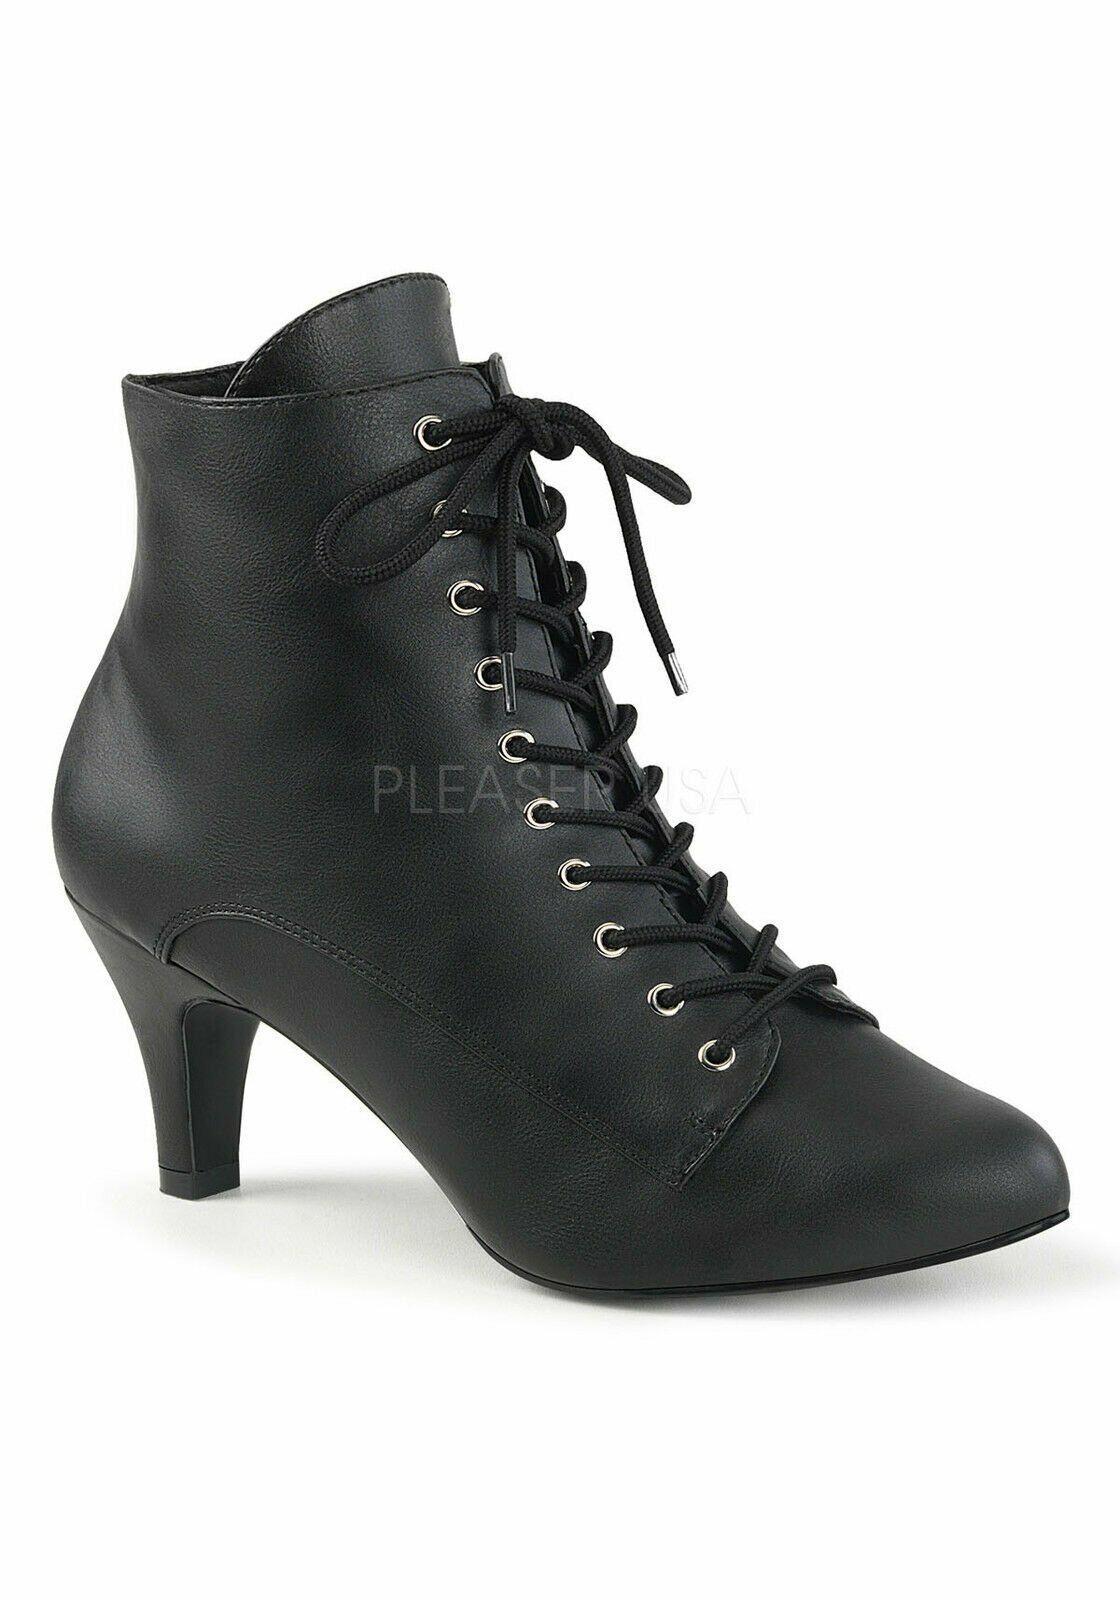 Pleaser DIVINE-1020 3 Inch Heel Ankle Boot